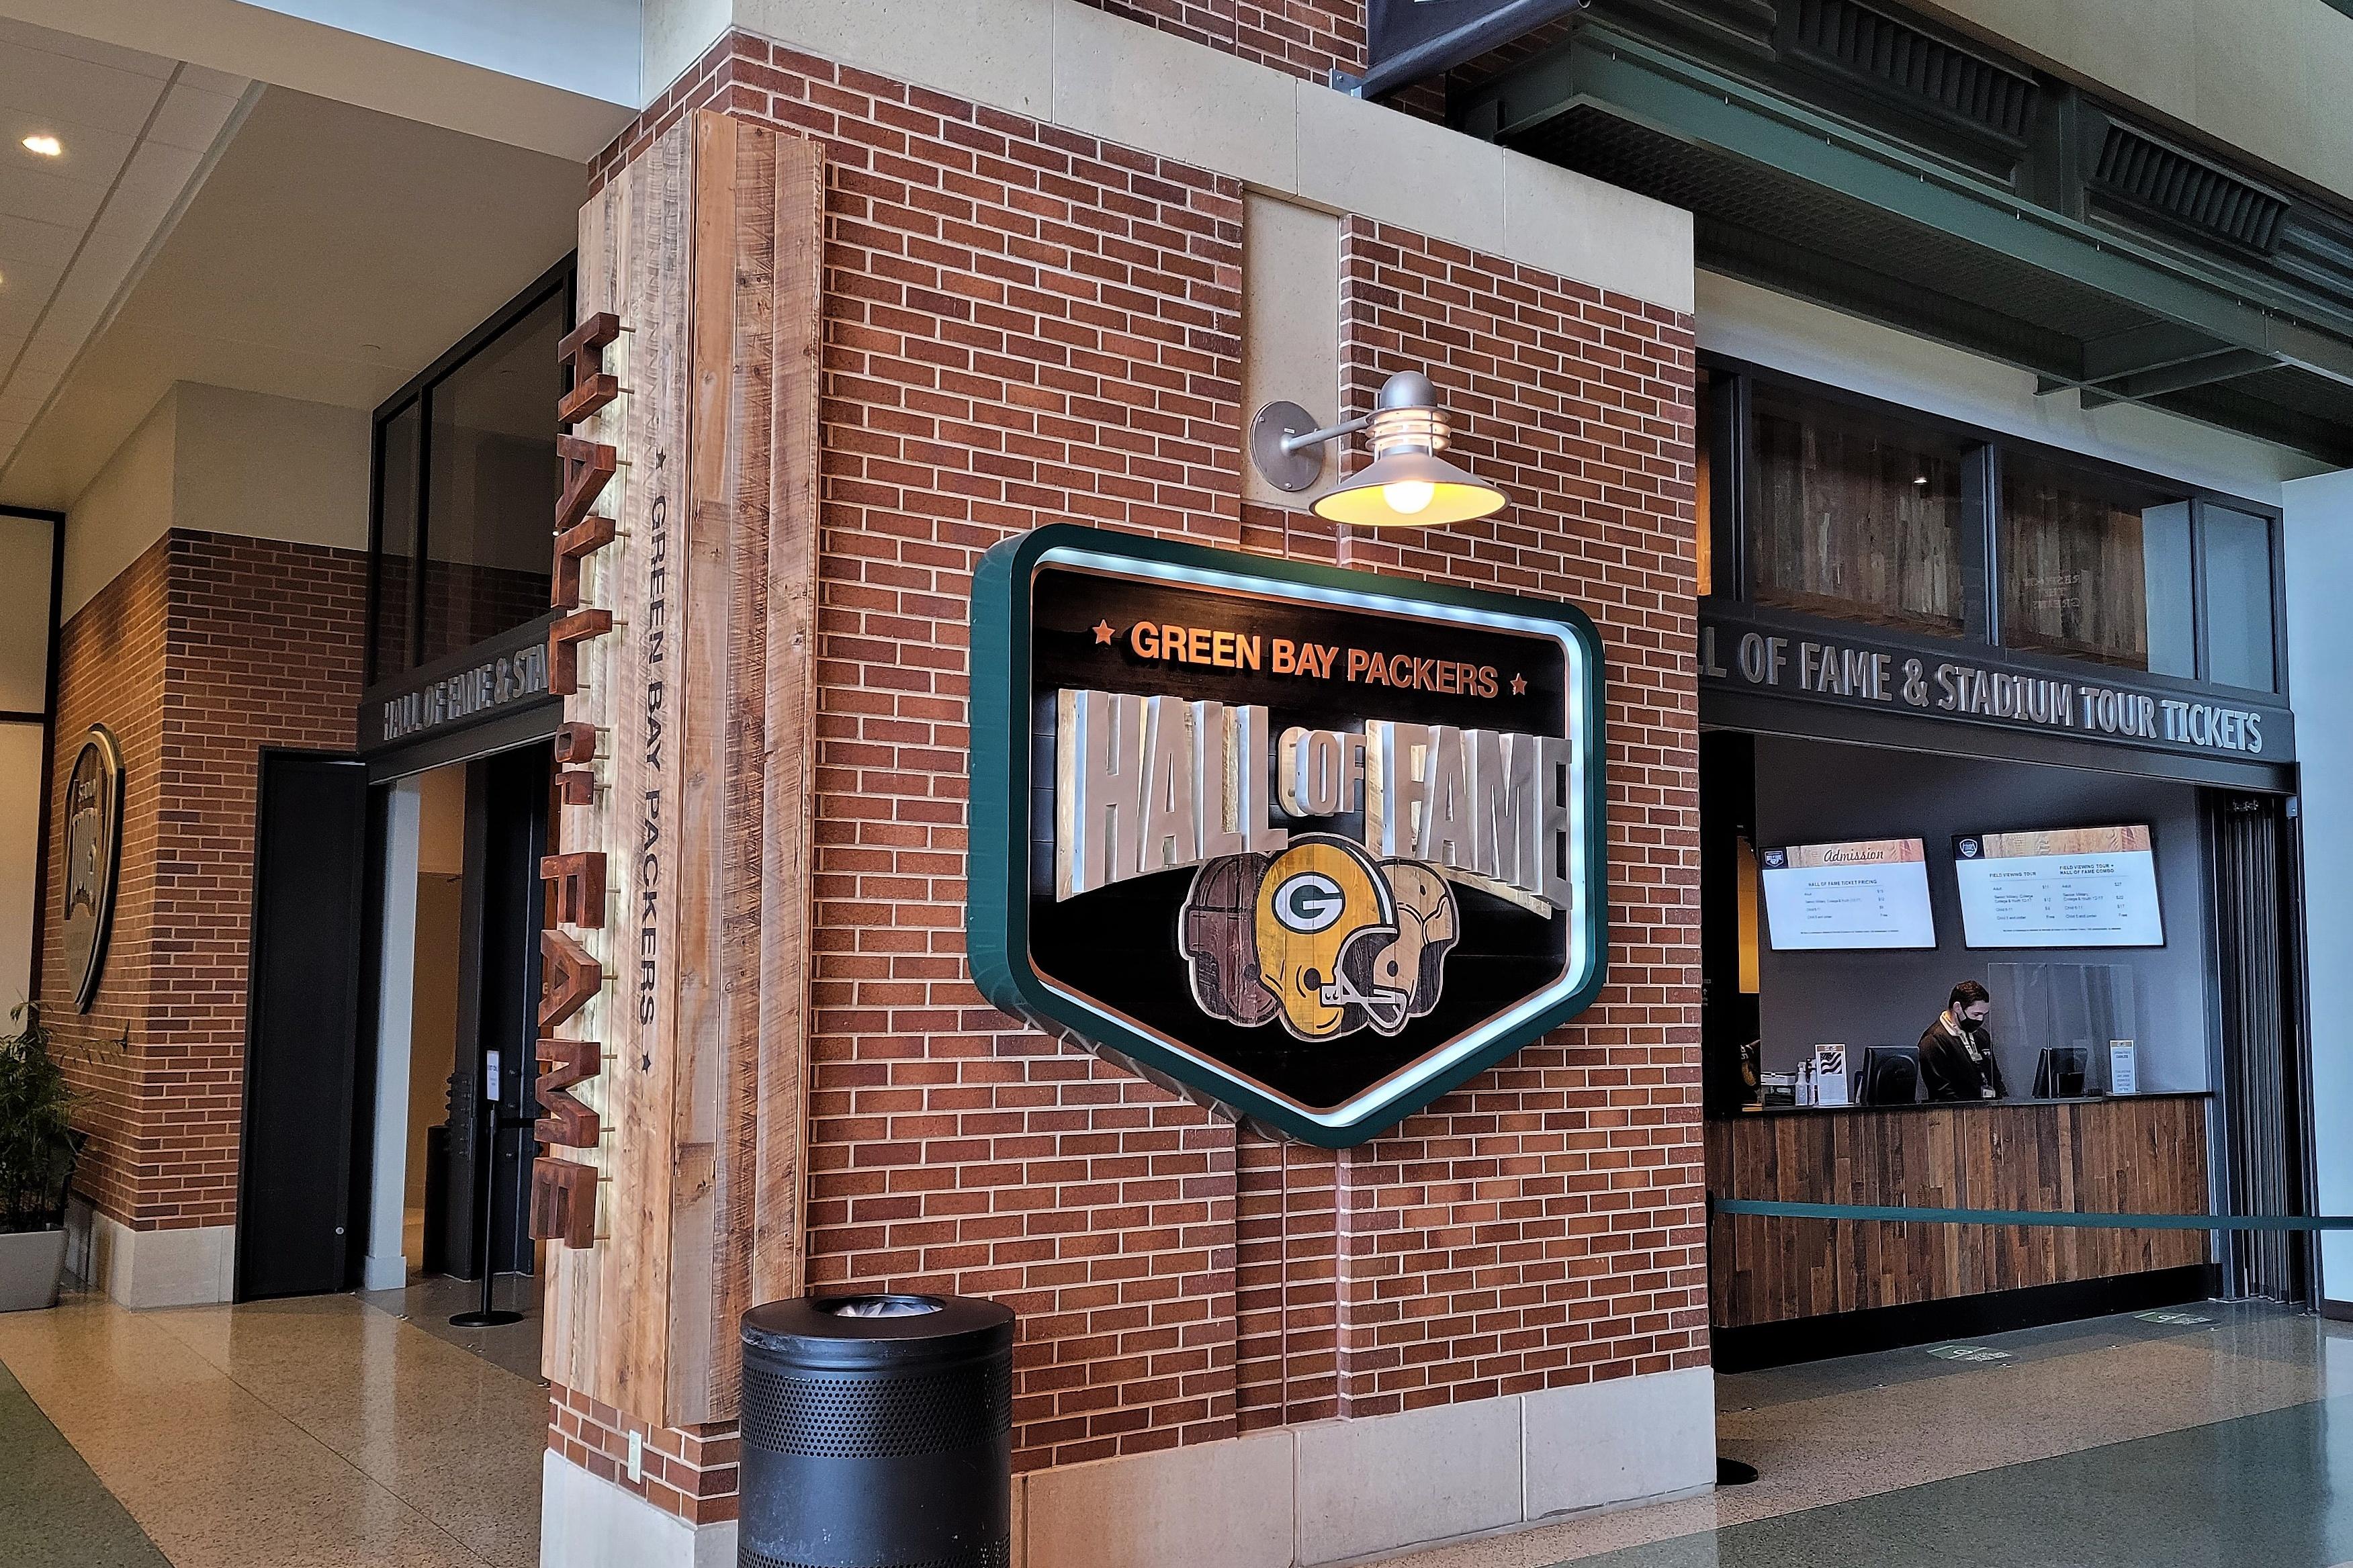 Hall of Fame Entrance